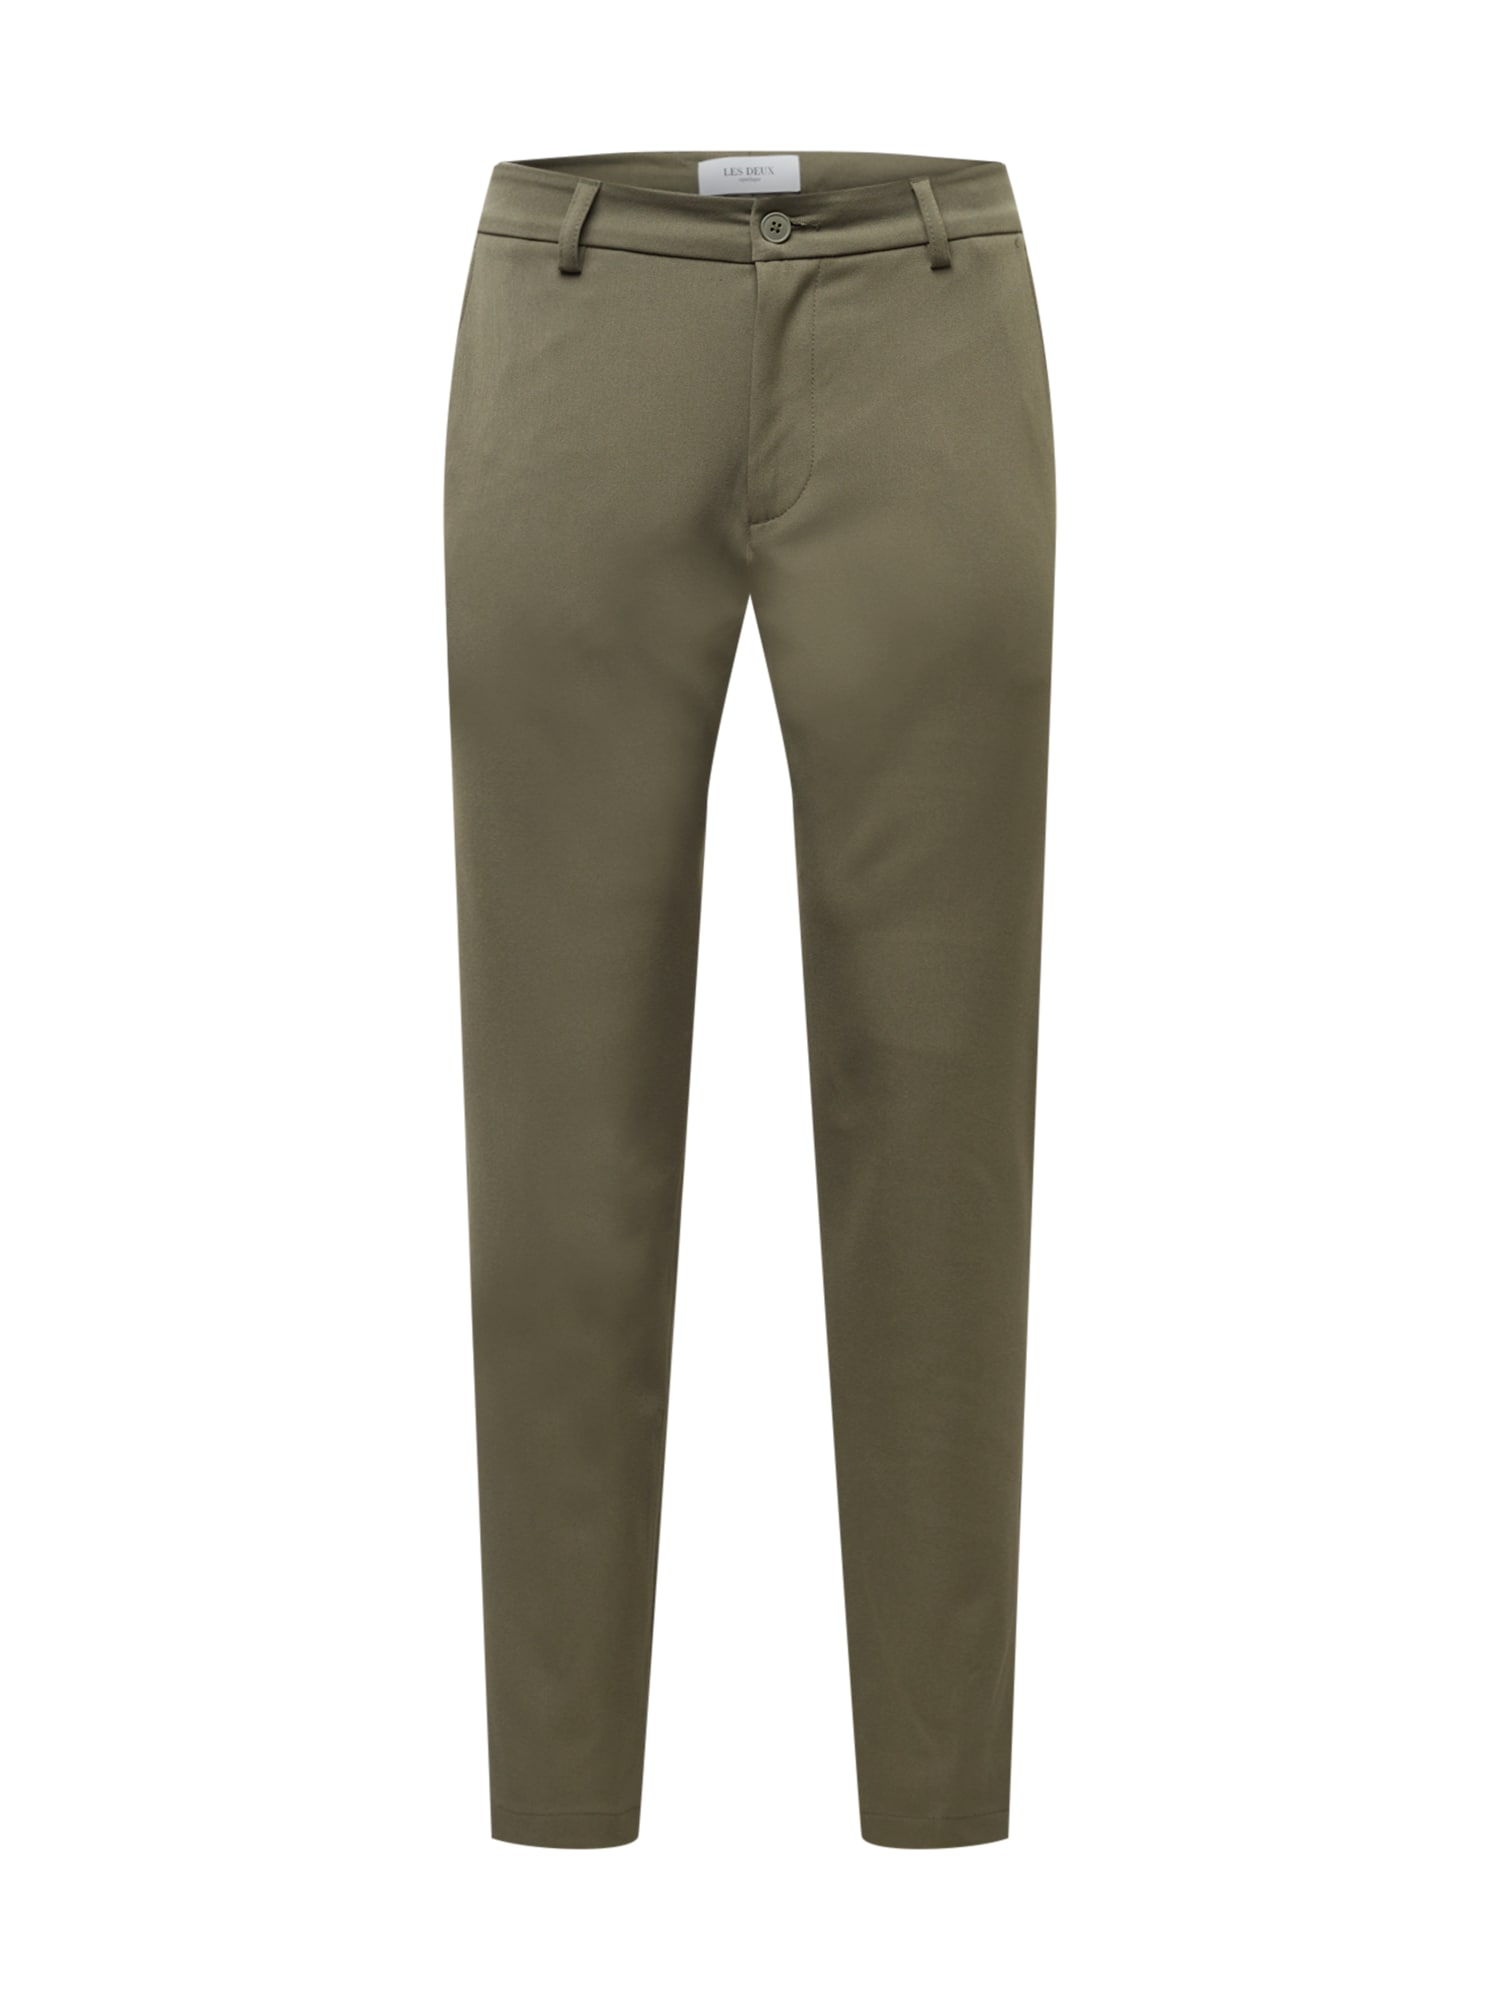 Les Deux Laisvo stiliaus kelnės